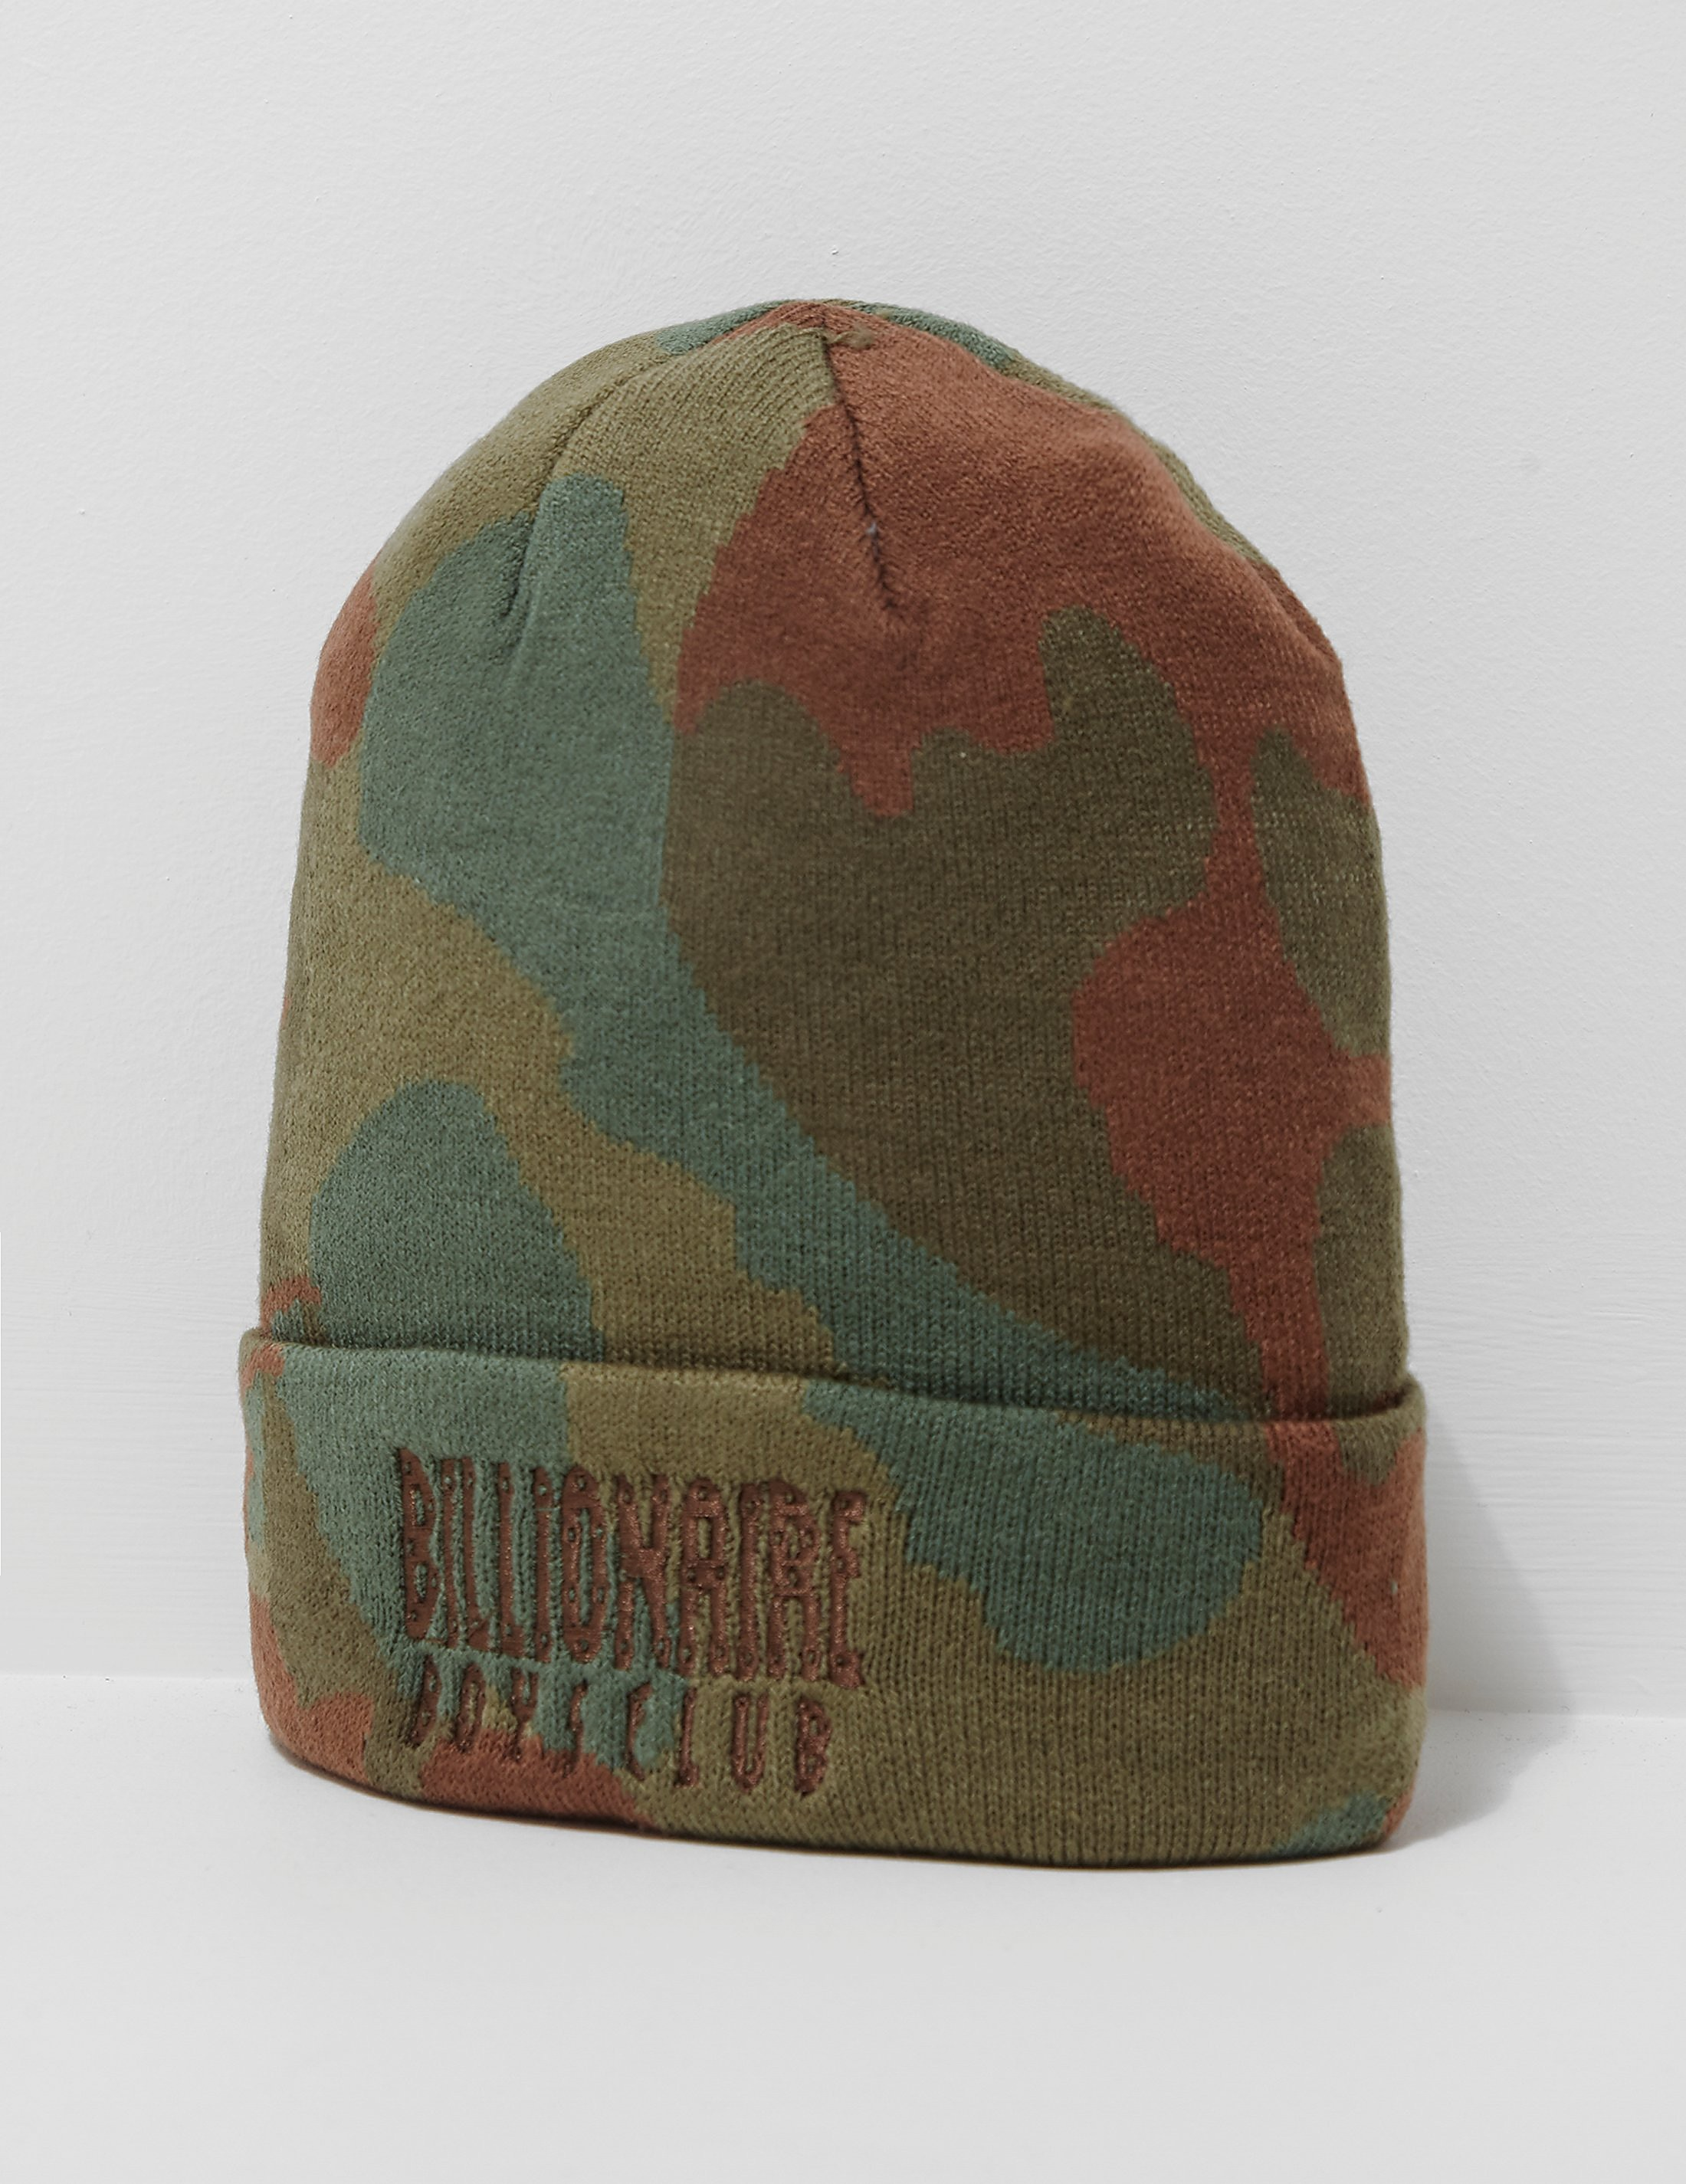 Billionaire Boys Club Space Camouflage Beanie